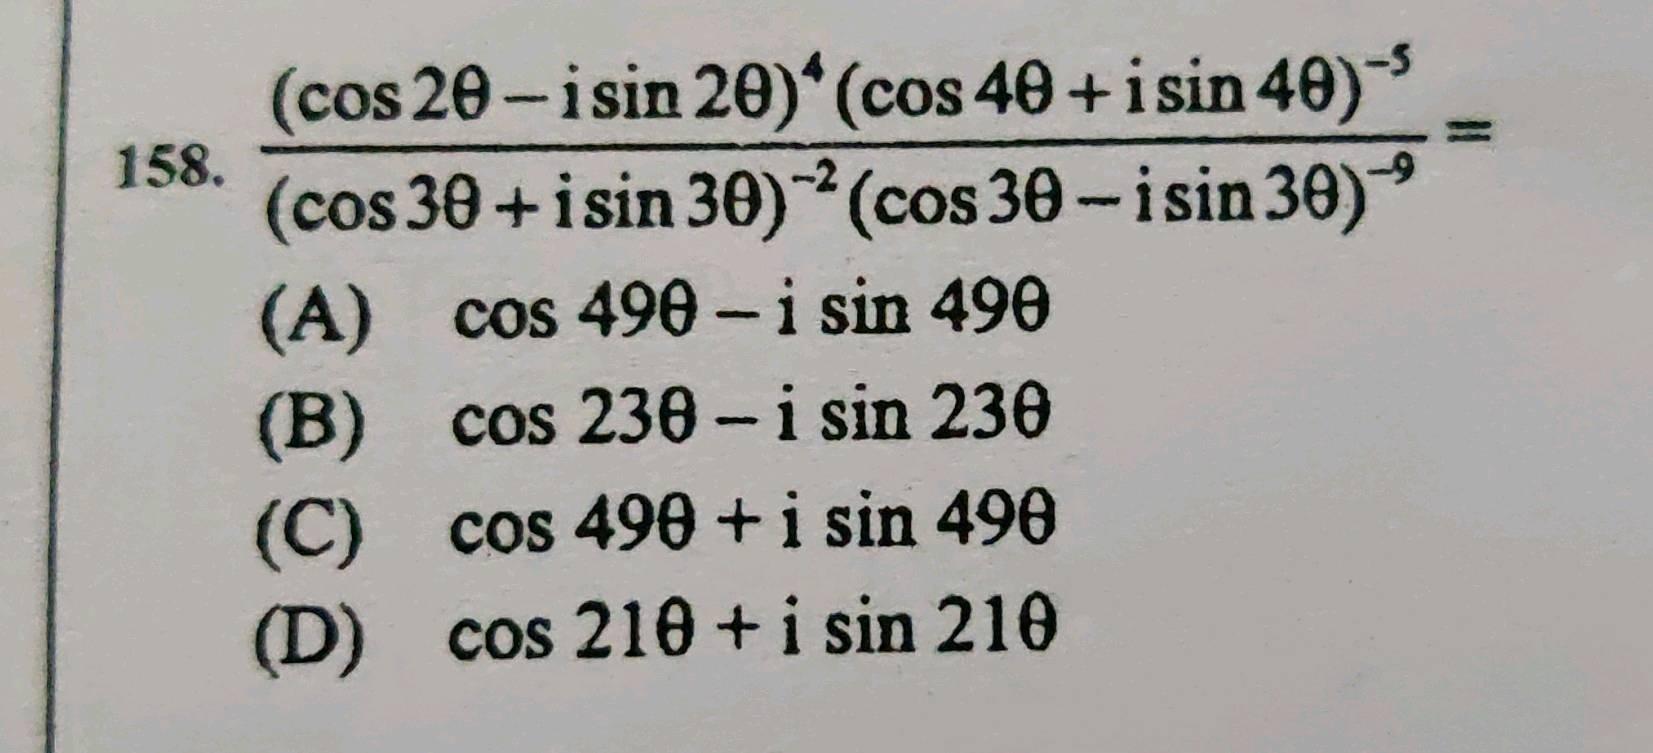 158 Frac Cos 2 Theta I Sin 2 Theta 4 Cos 4 Theta I Sin 4 Theta 5 Cos 3 Theta I Sin 3 Theta 2 Cos 3 Theta I Sin 3 Theta 9 A Cos 49 Theta I Sin 49 Theta B Cos 23